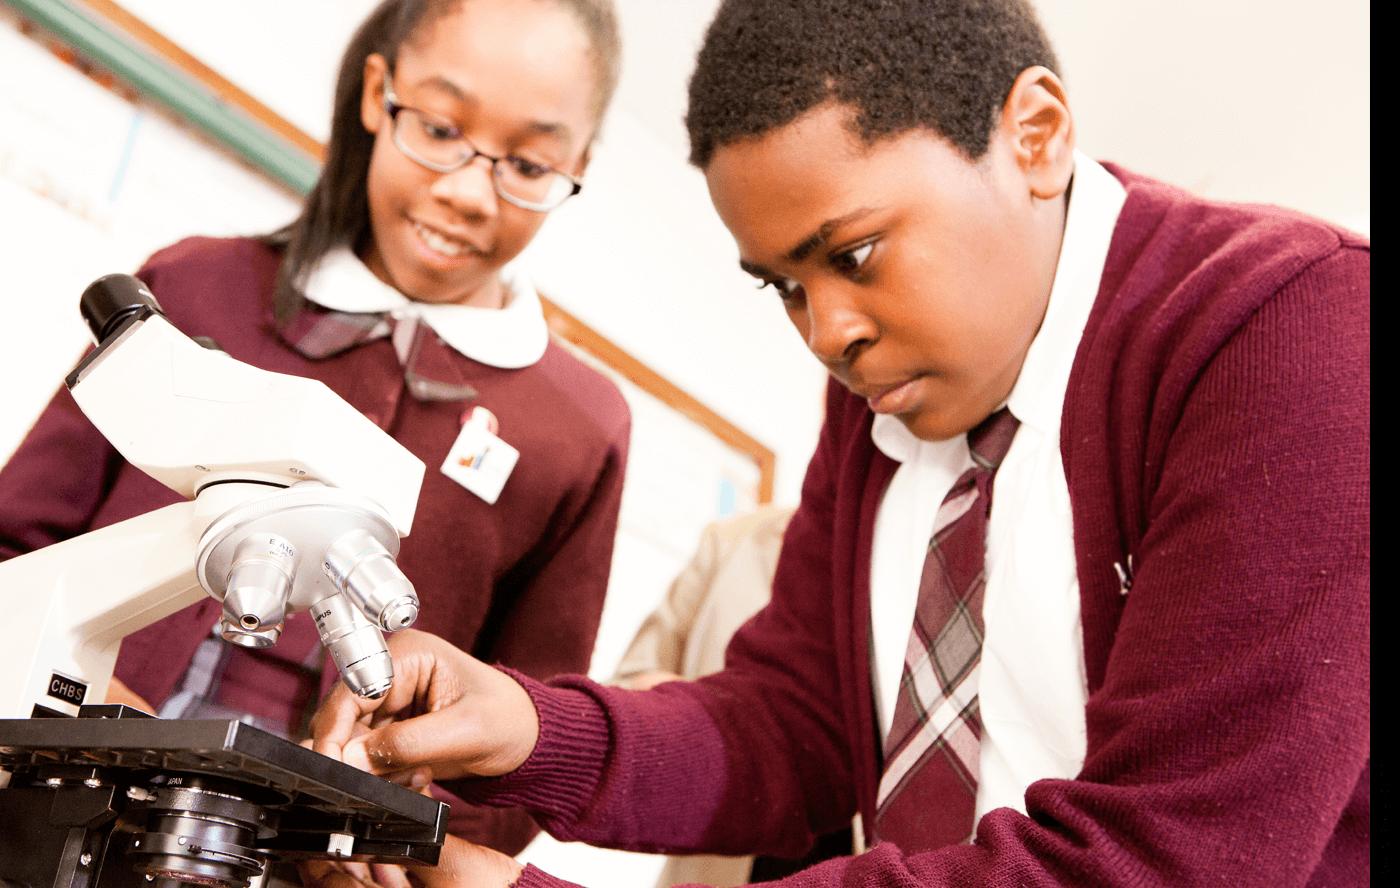 Students at Mt. Carmel-Holy Rosary School Catholic Elementary School in New York, N.Y., using a microscope